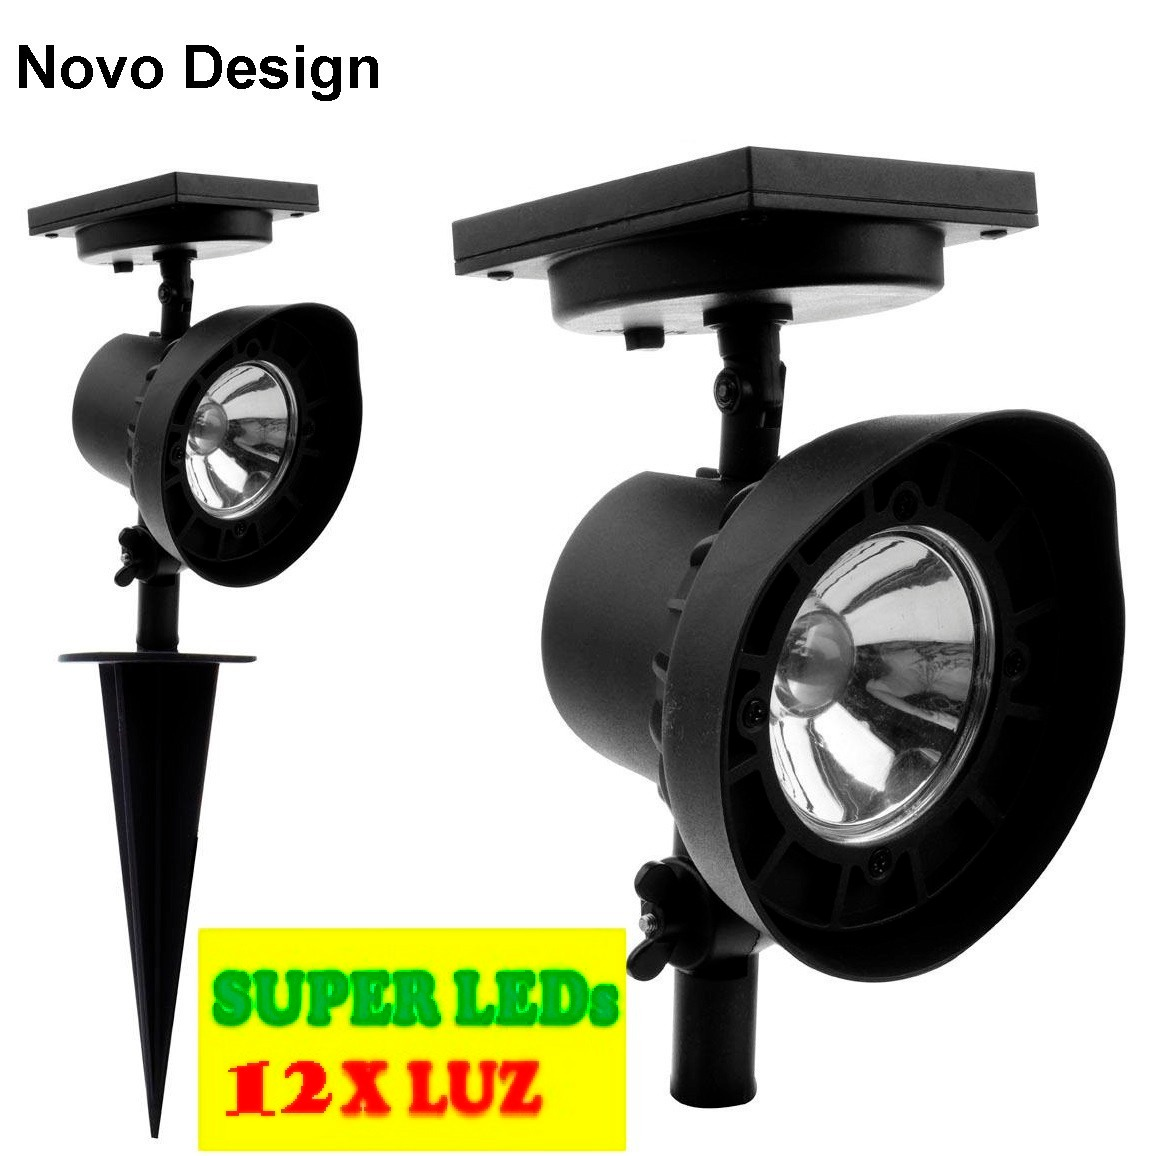 iluminacao jardim solar:Refletor Led Solar Luminária Jardim Spot 6xluz Verde-branca – R$ 49